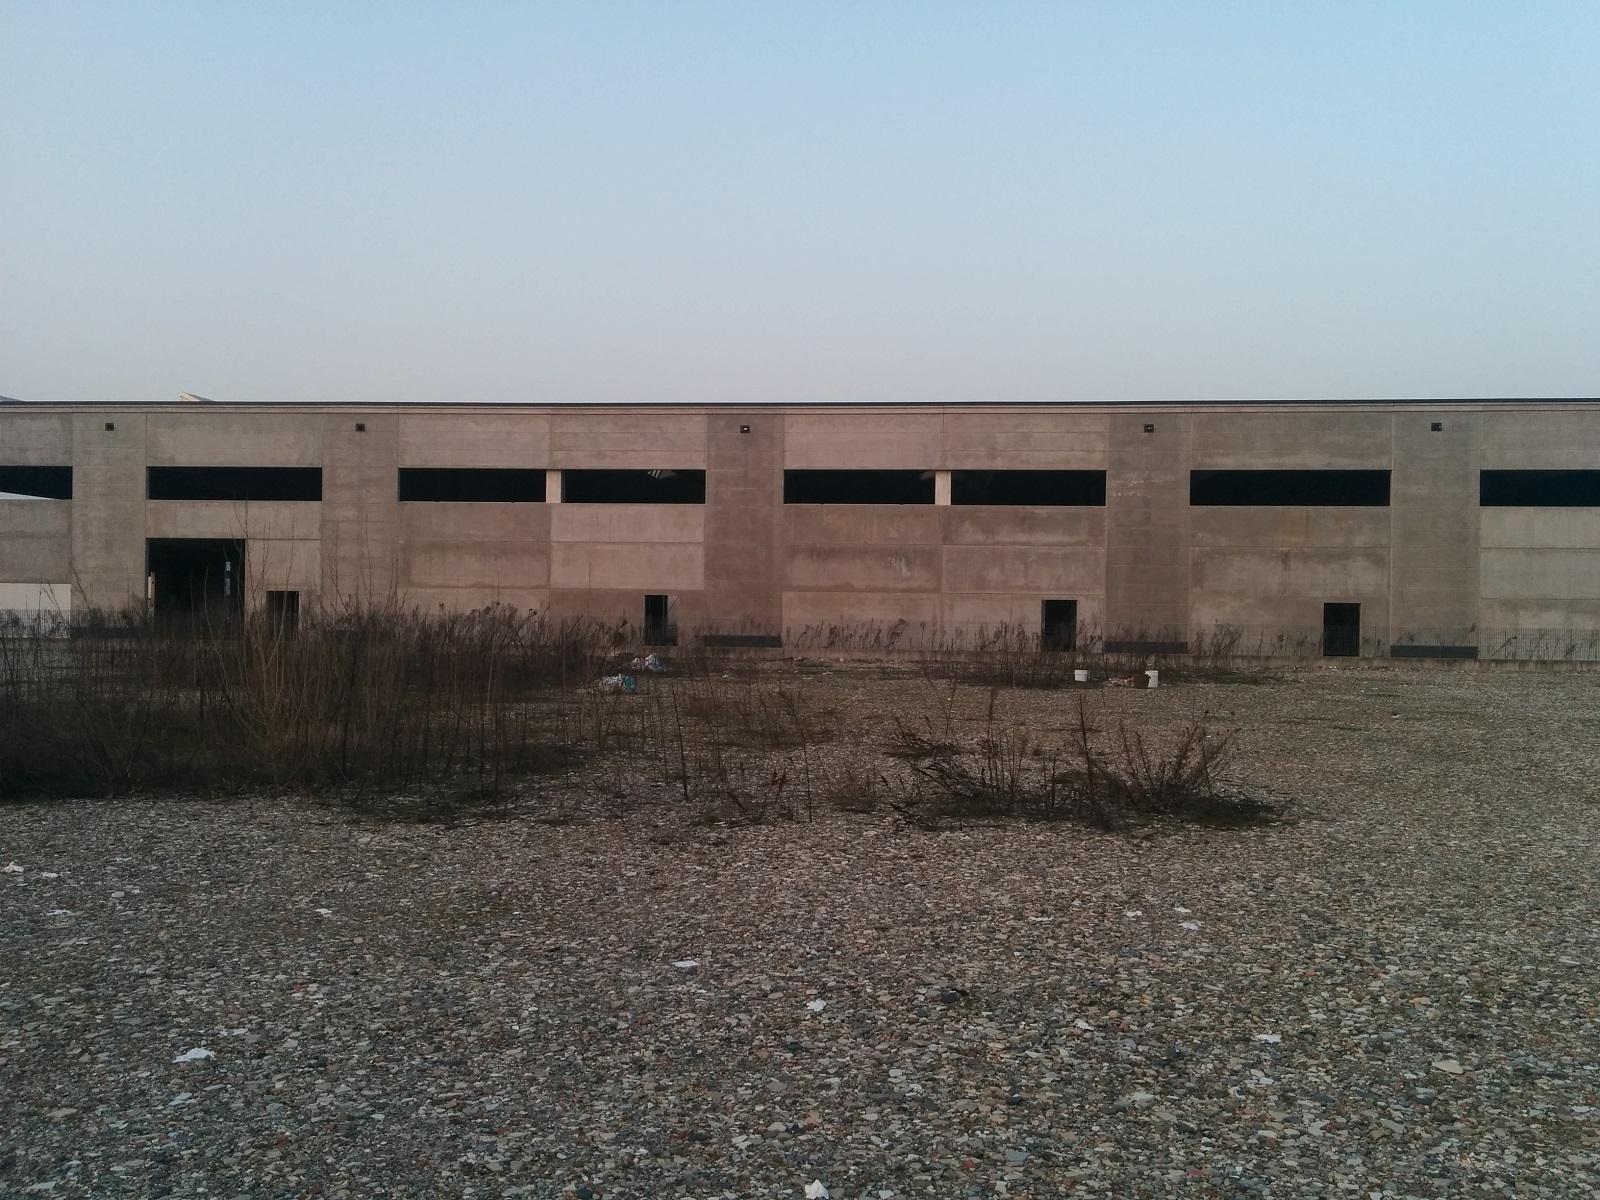 Machweo - La zona industriale di Carpi